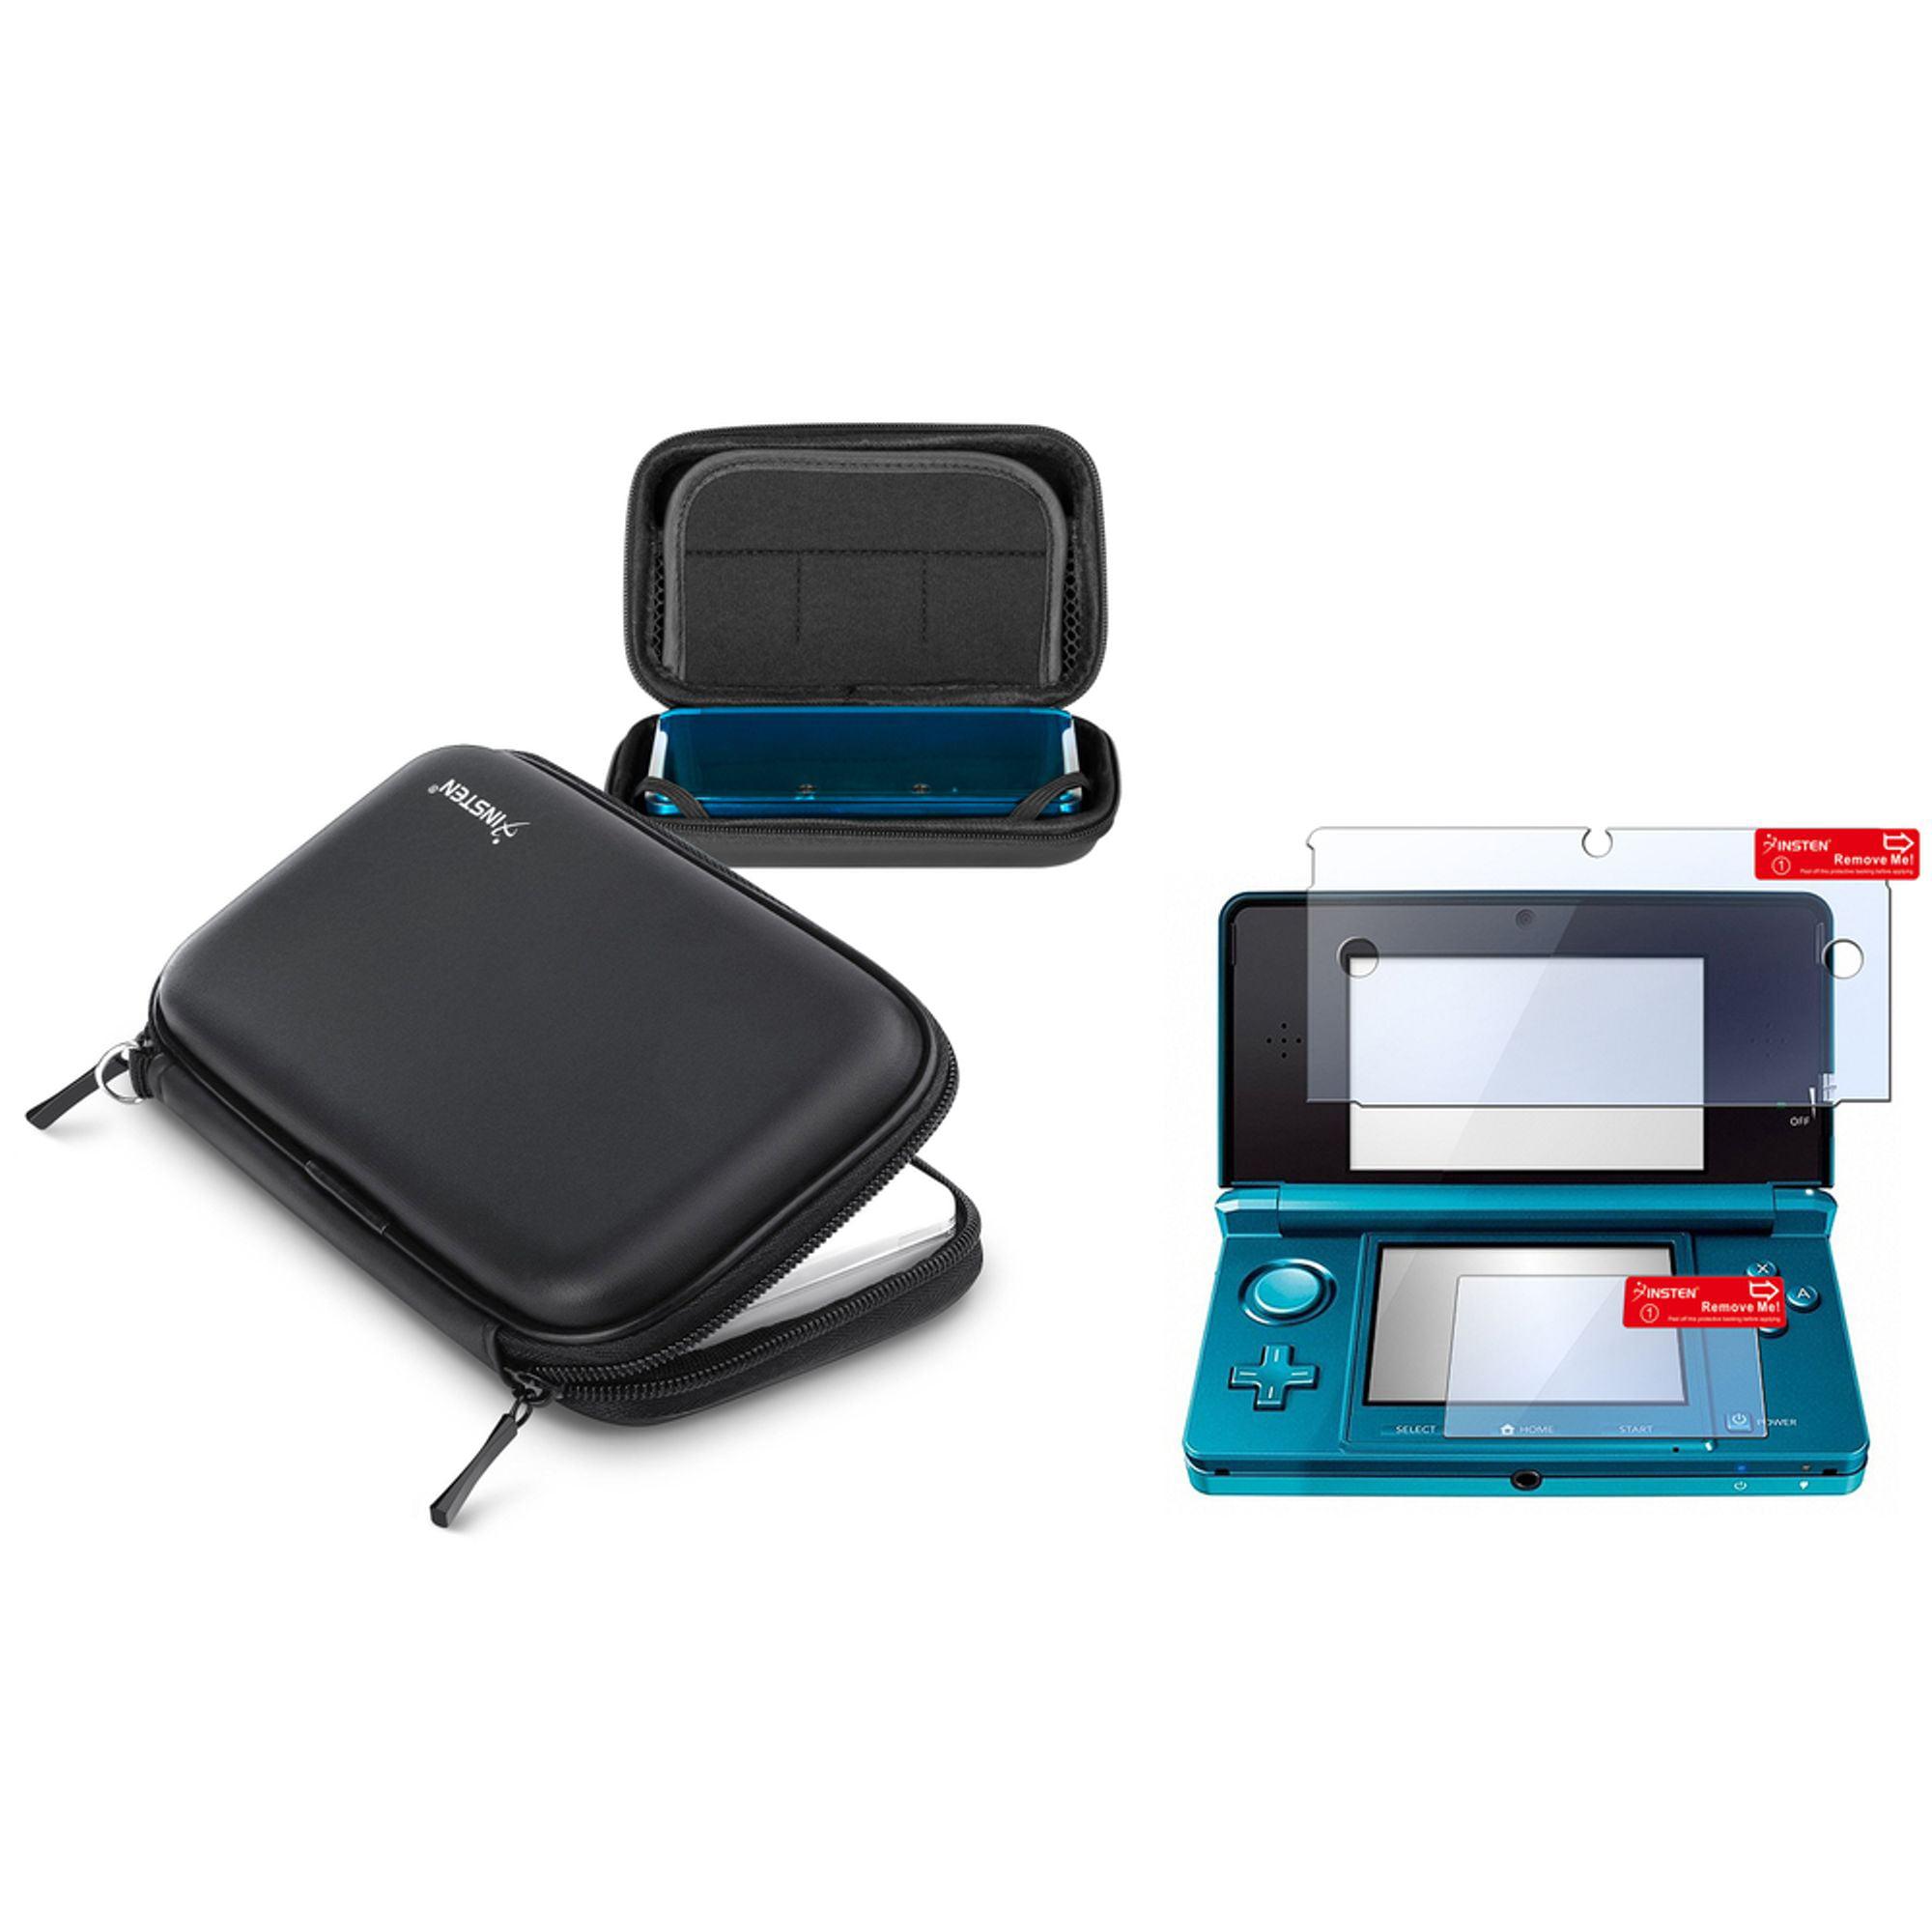 Insten For Nintendo 3DS BLACK EVA CASE WITH SCREEN PROTECTOR